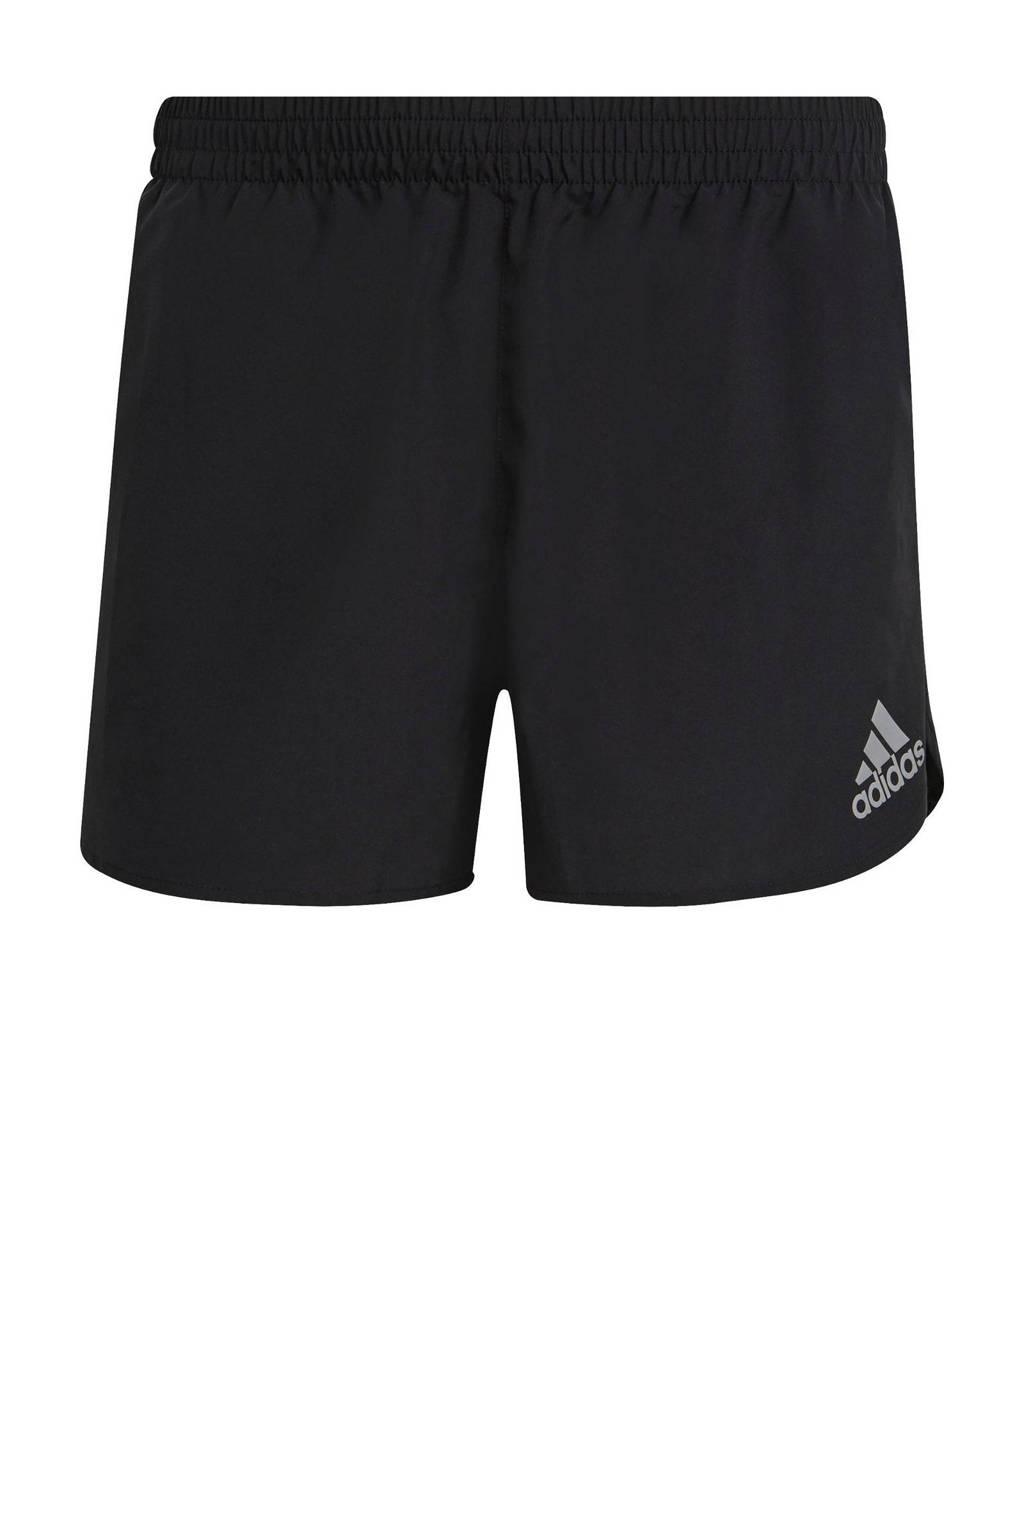 adidas Performance   Adizero hardloop short zwart, Zwart